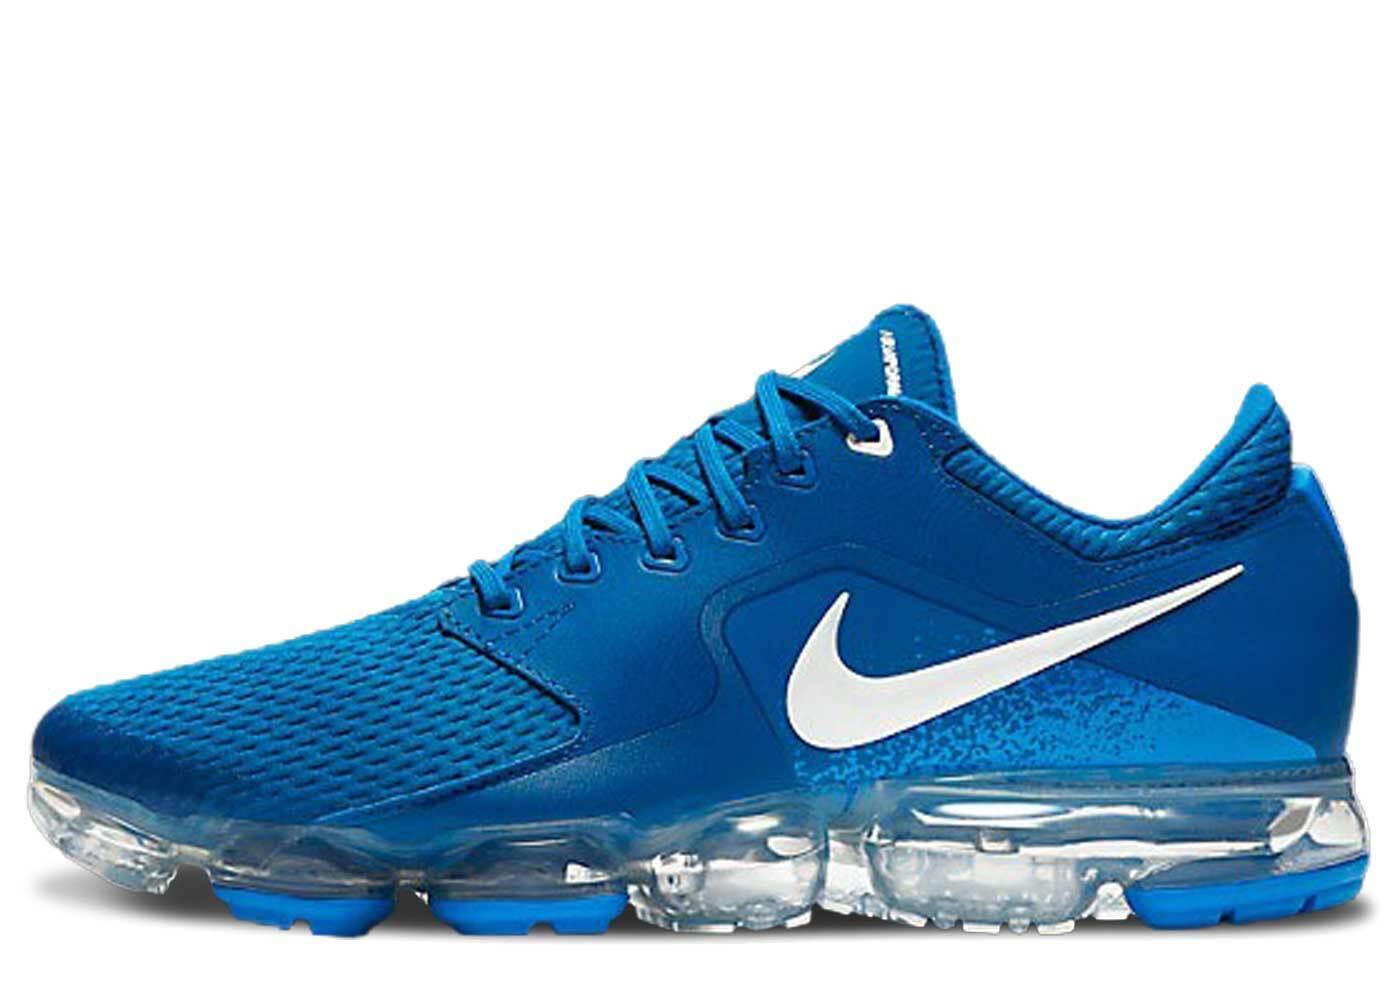 Nike Air VaporMax CS Military Blueの写真